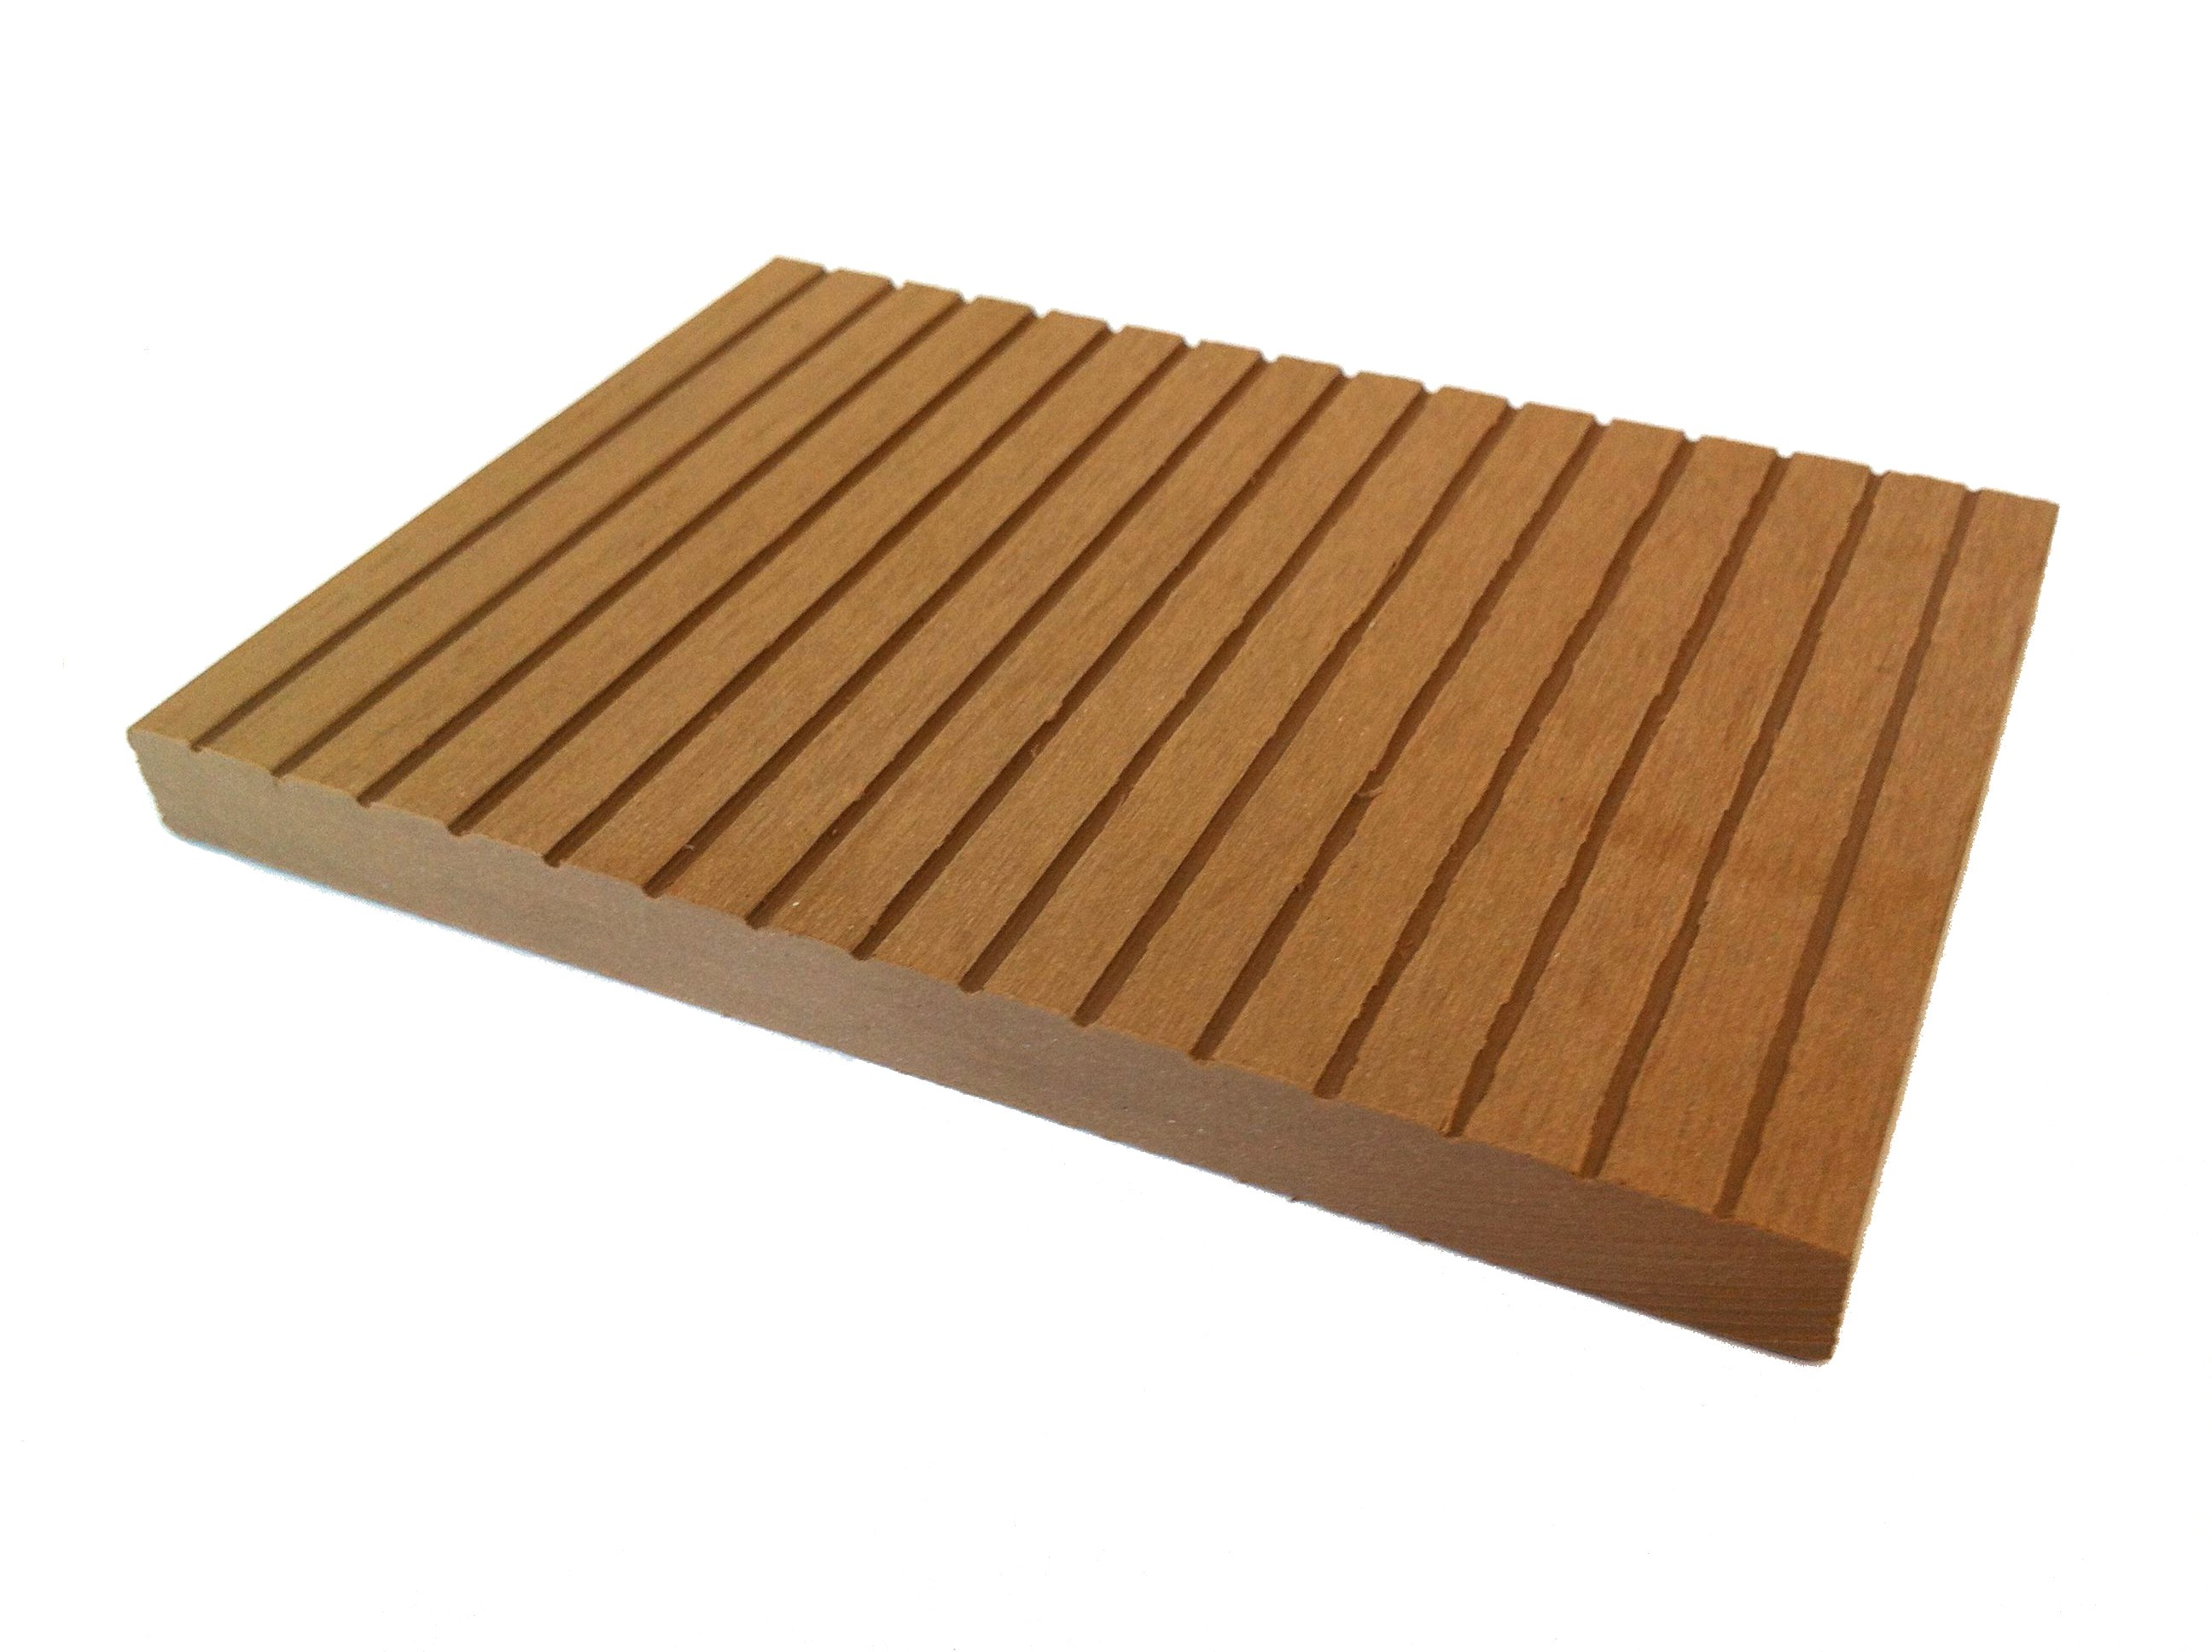 Tarima de exterior de madera sint tica perfil radapie 39 by - Tarimas de madera para exterior ...